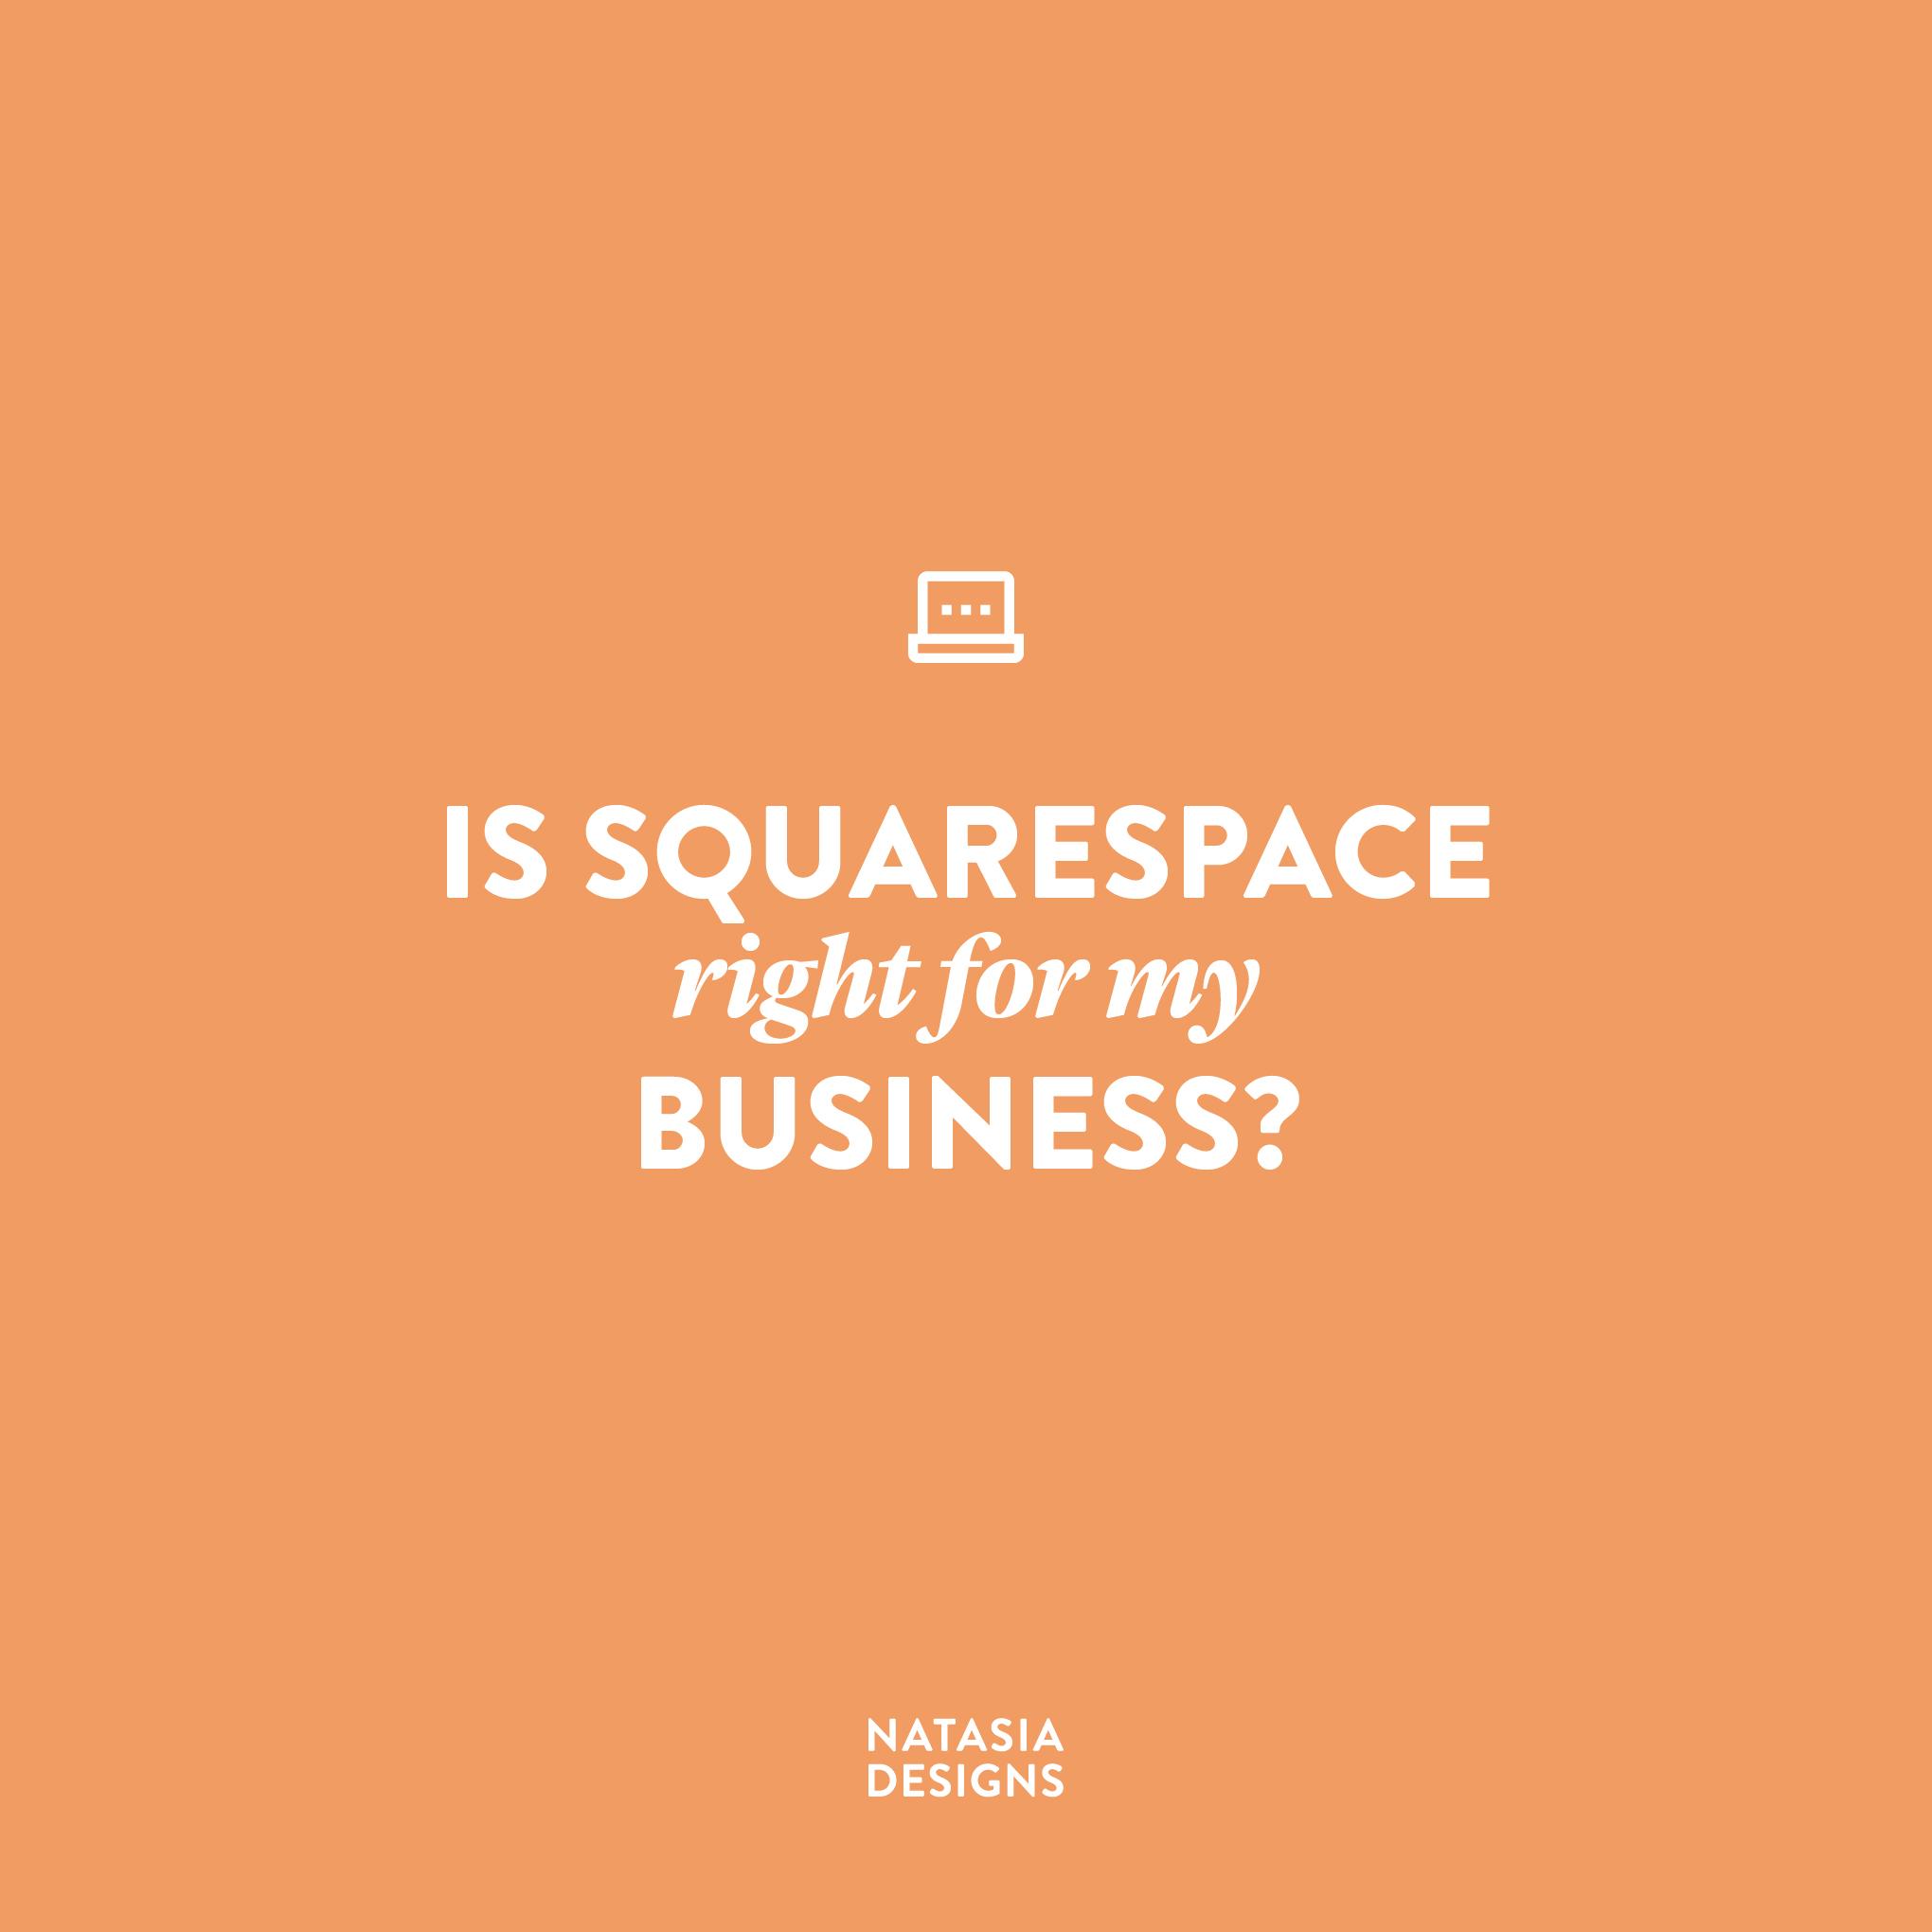 NatasiaDesigns_Squarespace_BlogPost_New-01.jpg